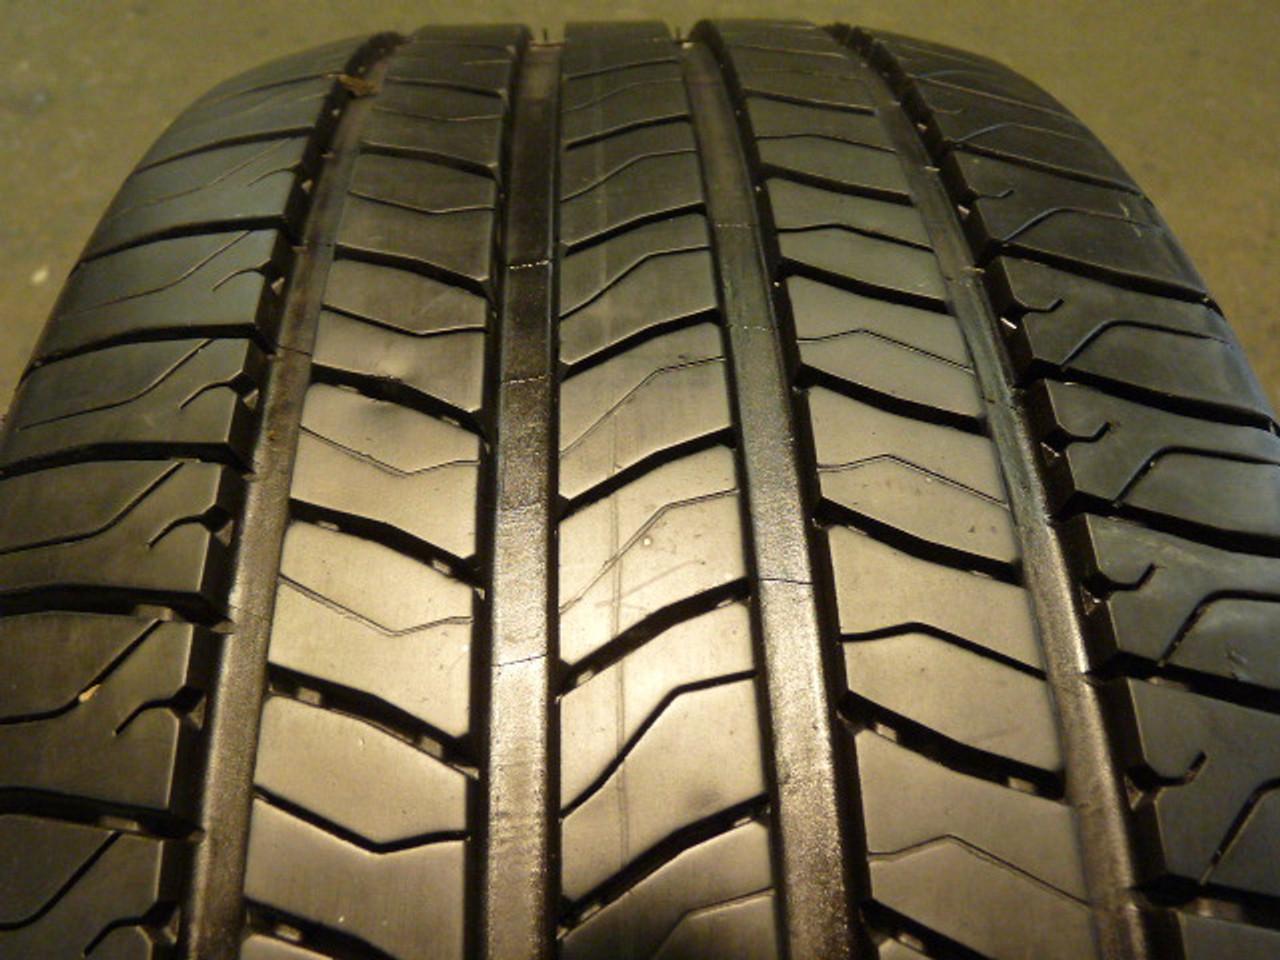 Used Take Off 235 45 18 Michelin Tire P235/45R18